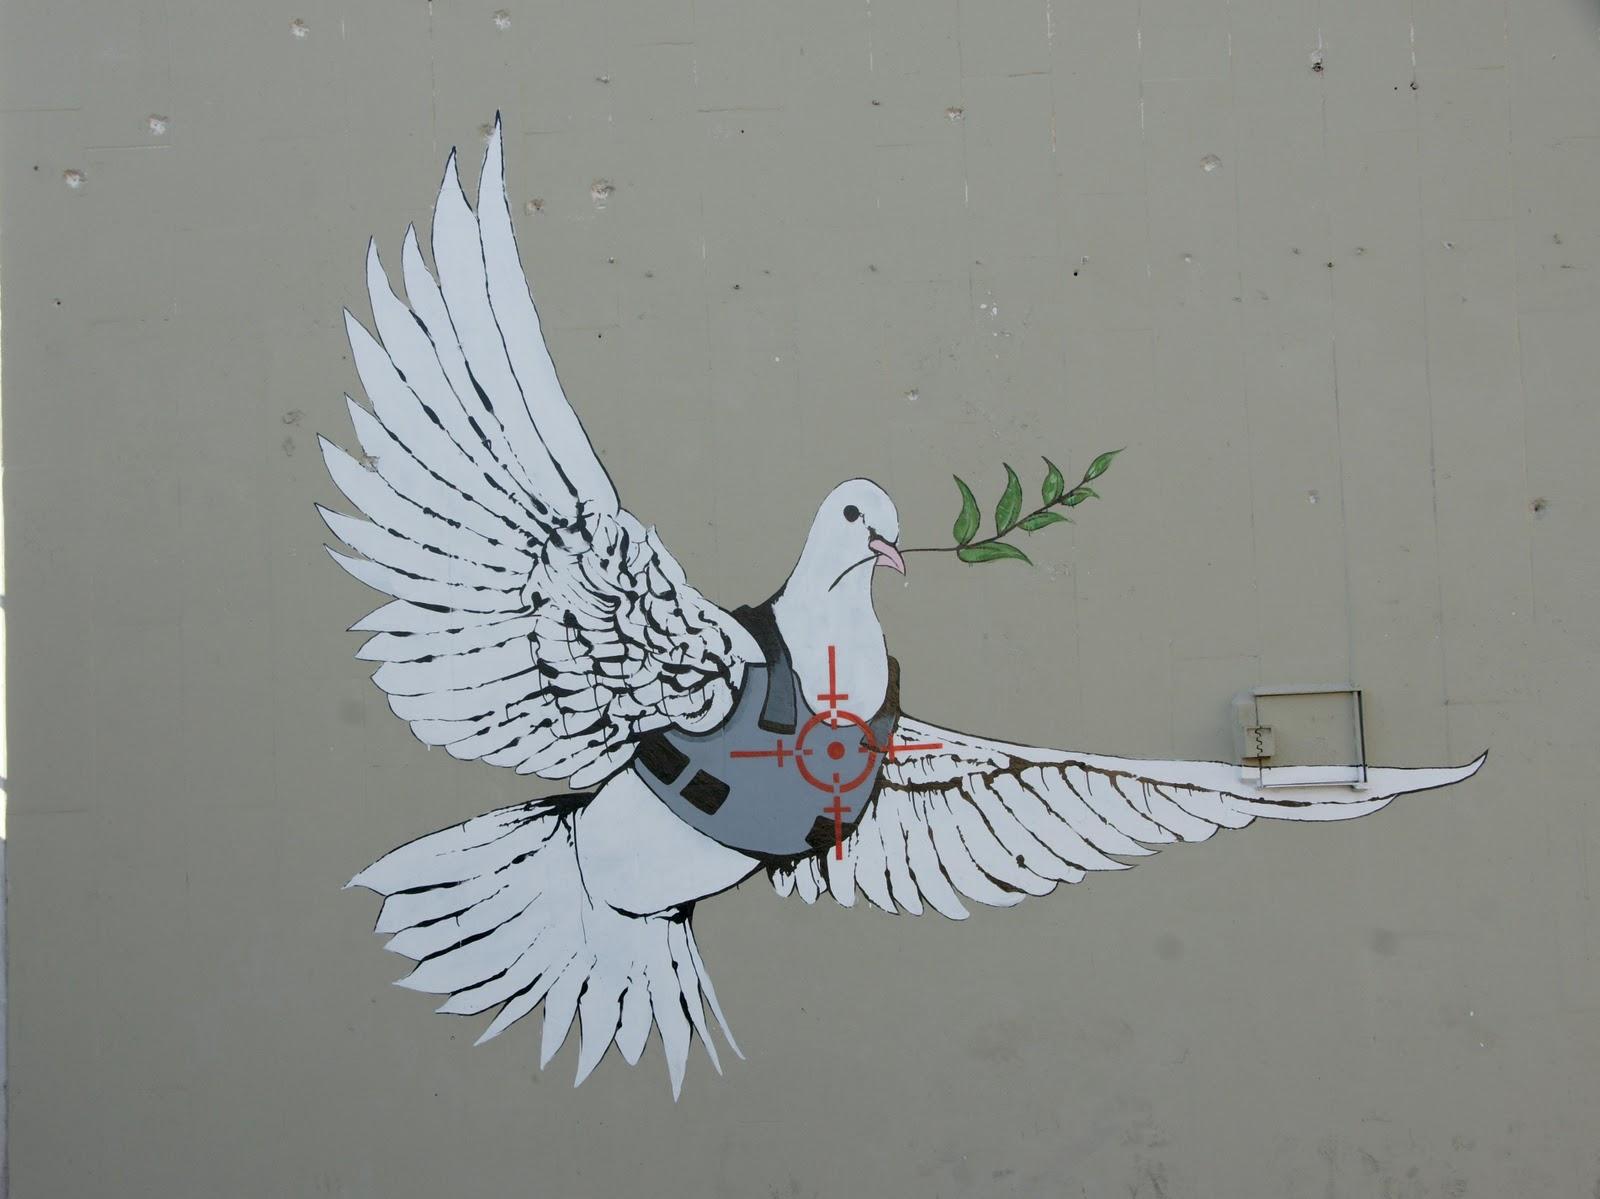 http://3.bp.blogspot.com/_eucXILfI5Yg/TK9JsF4-3KI/AAAAAAAAAP0/RQVvuVzbLyo/s1600/Banksy_dove.jpg